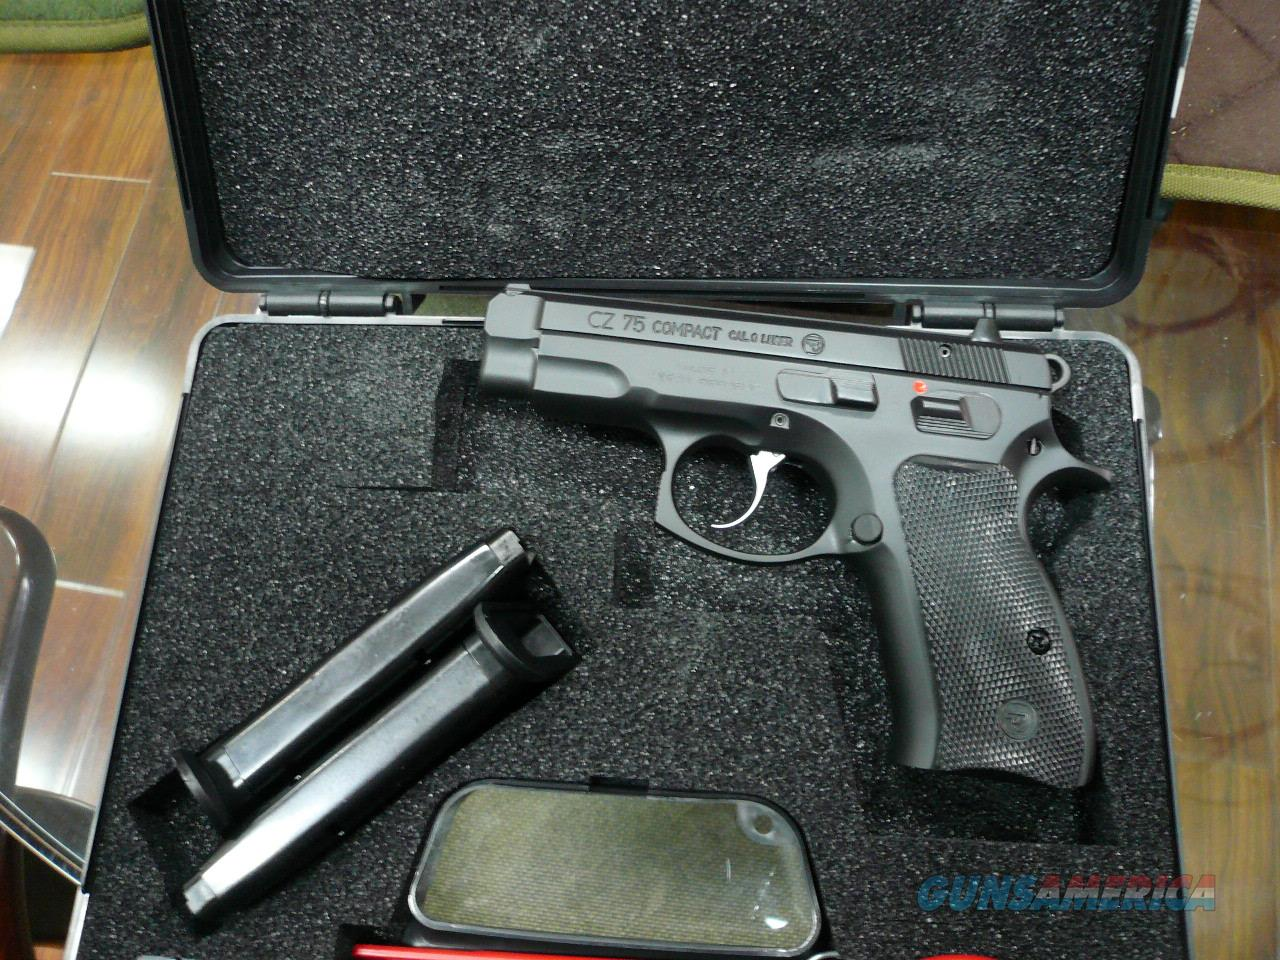 CZ75 COMPACT 9MM ,NIB  Guns > Pistols > CZ Pistols